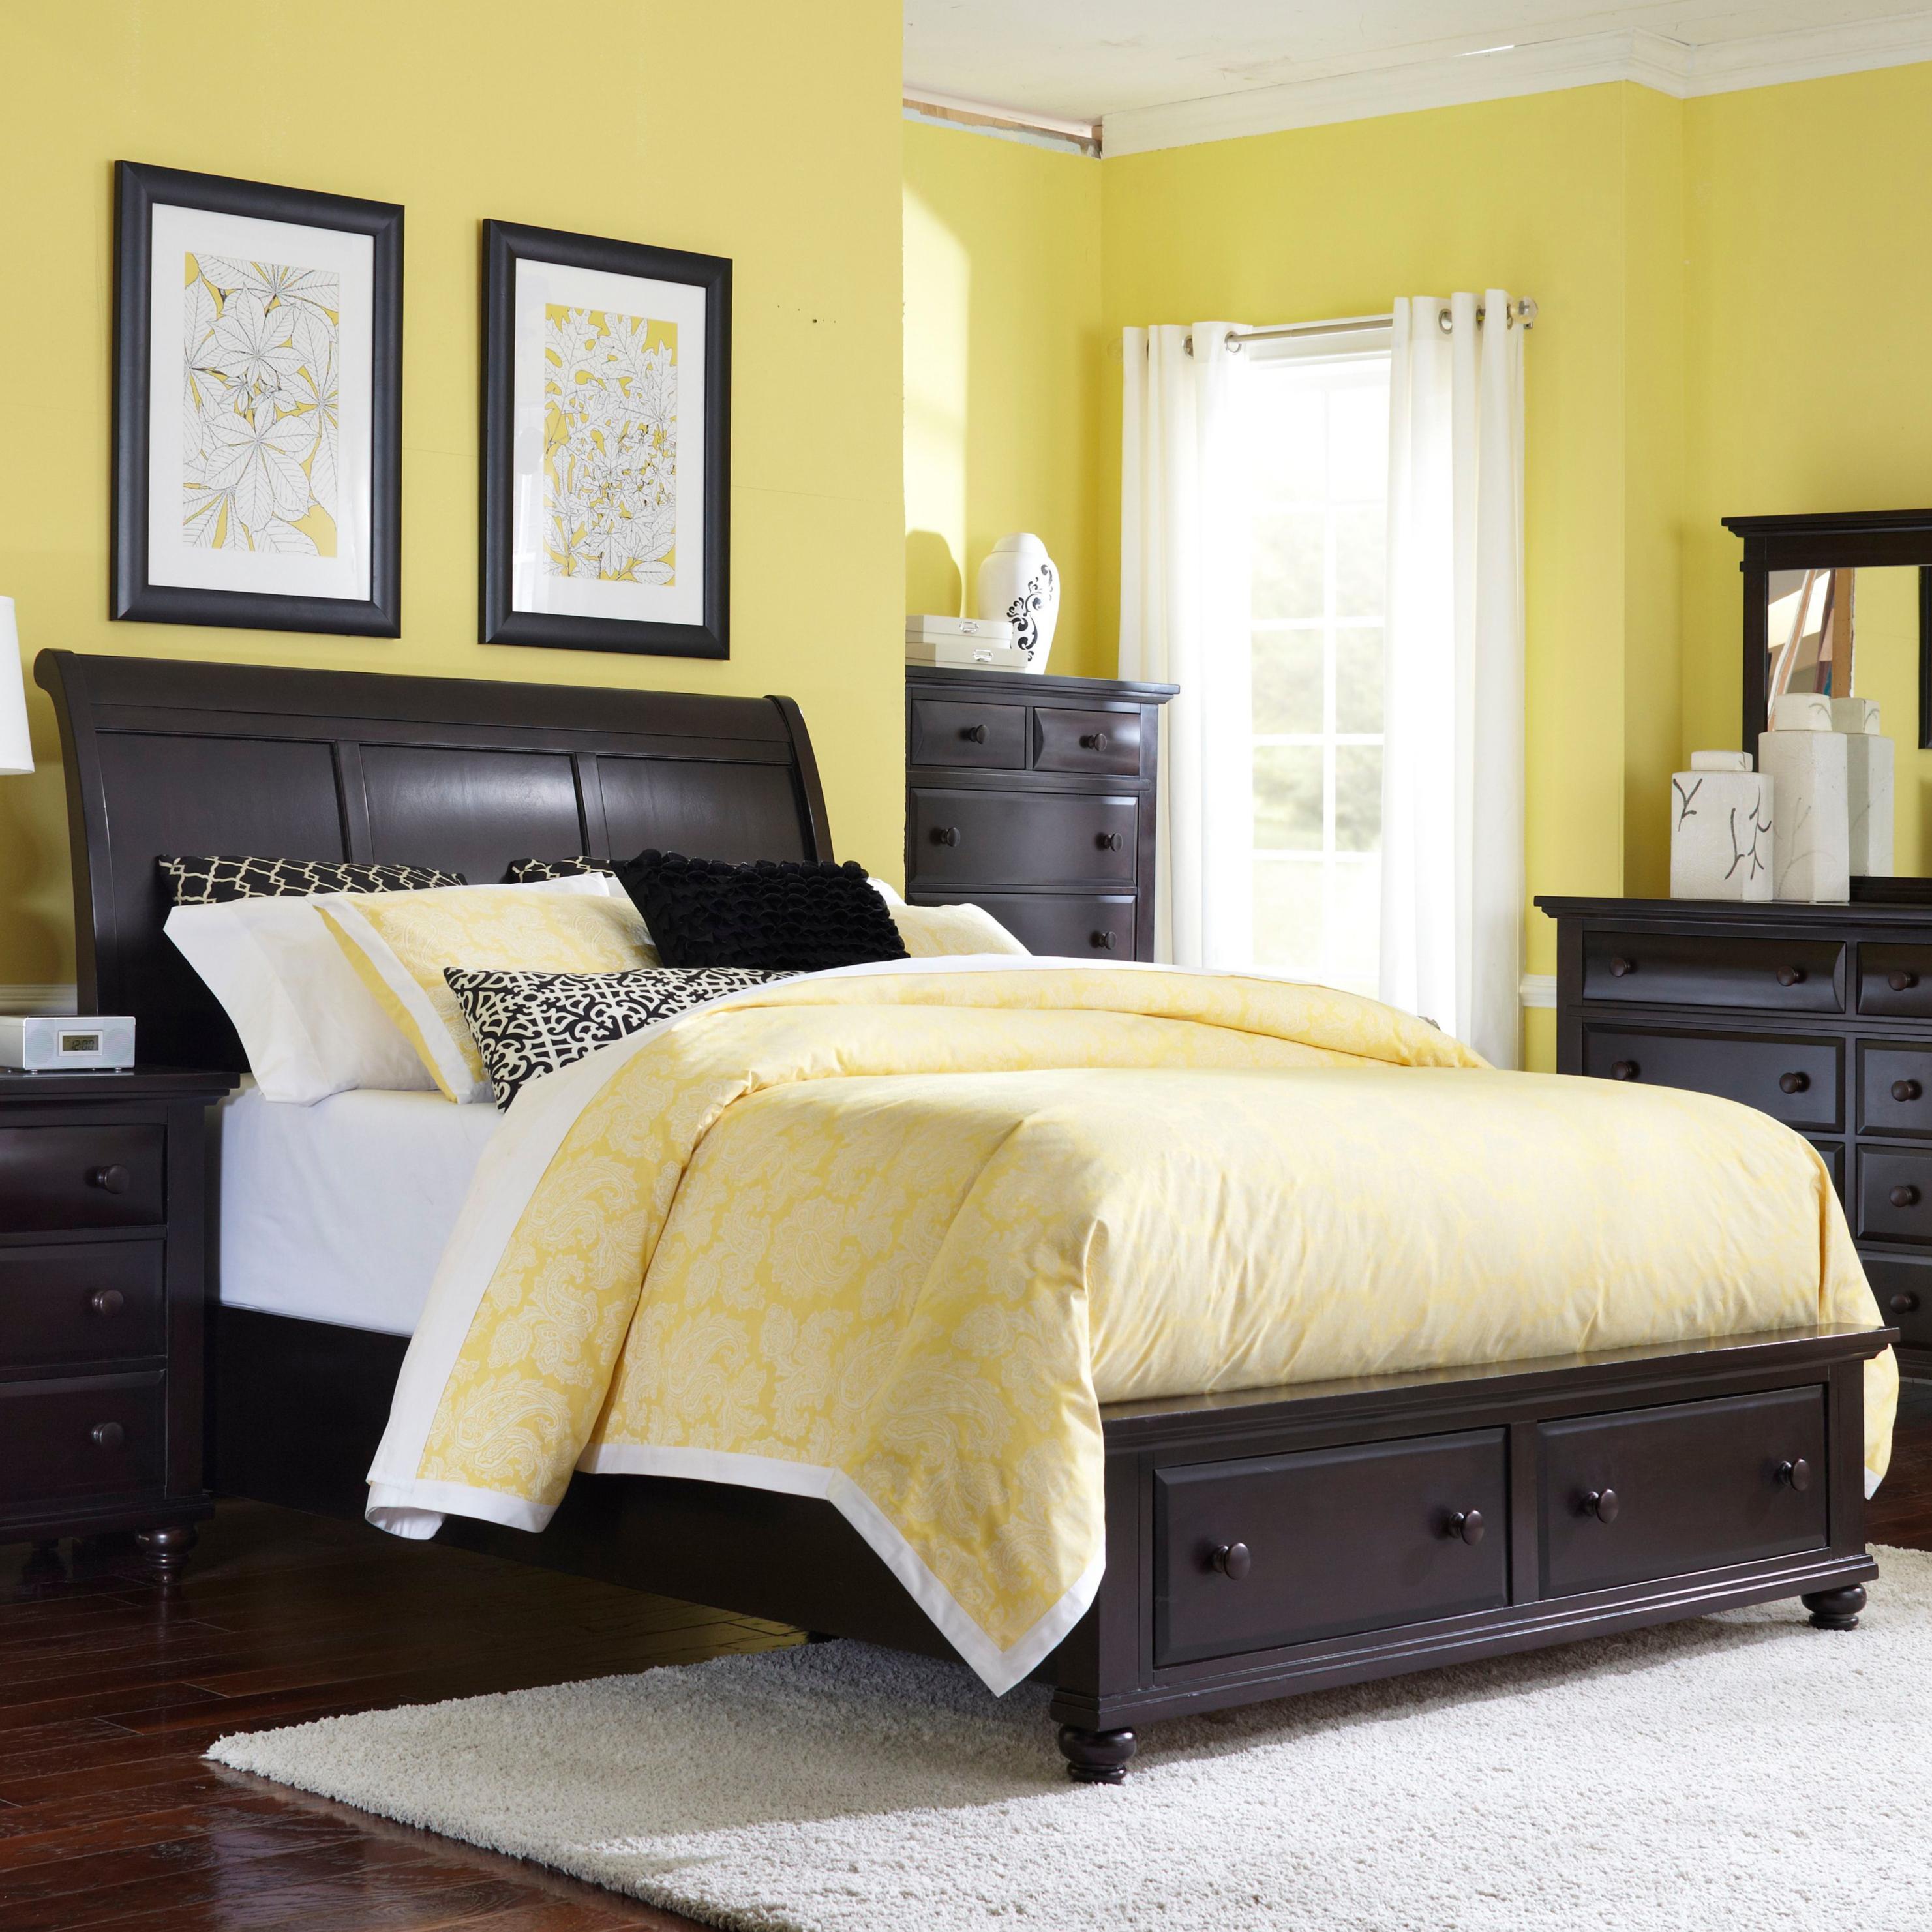 Broyhill Furniture FarnsworthQueen Sleigh Bed With Storage